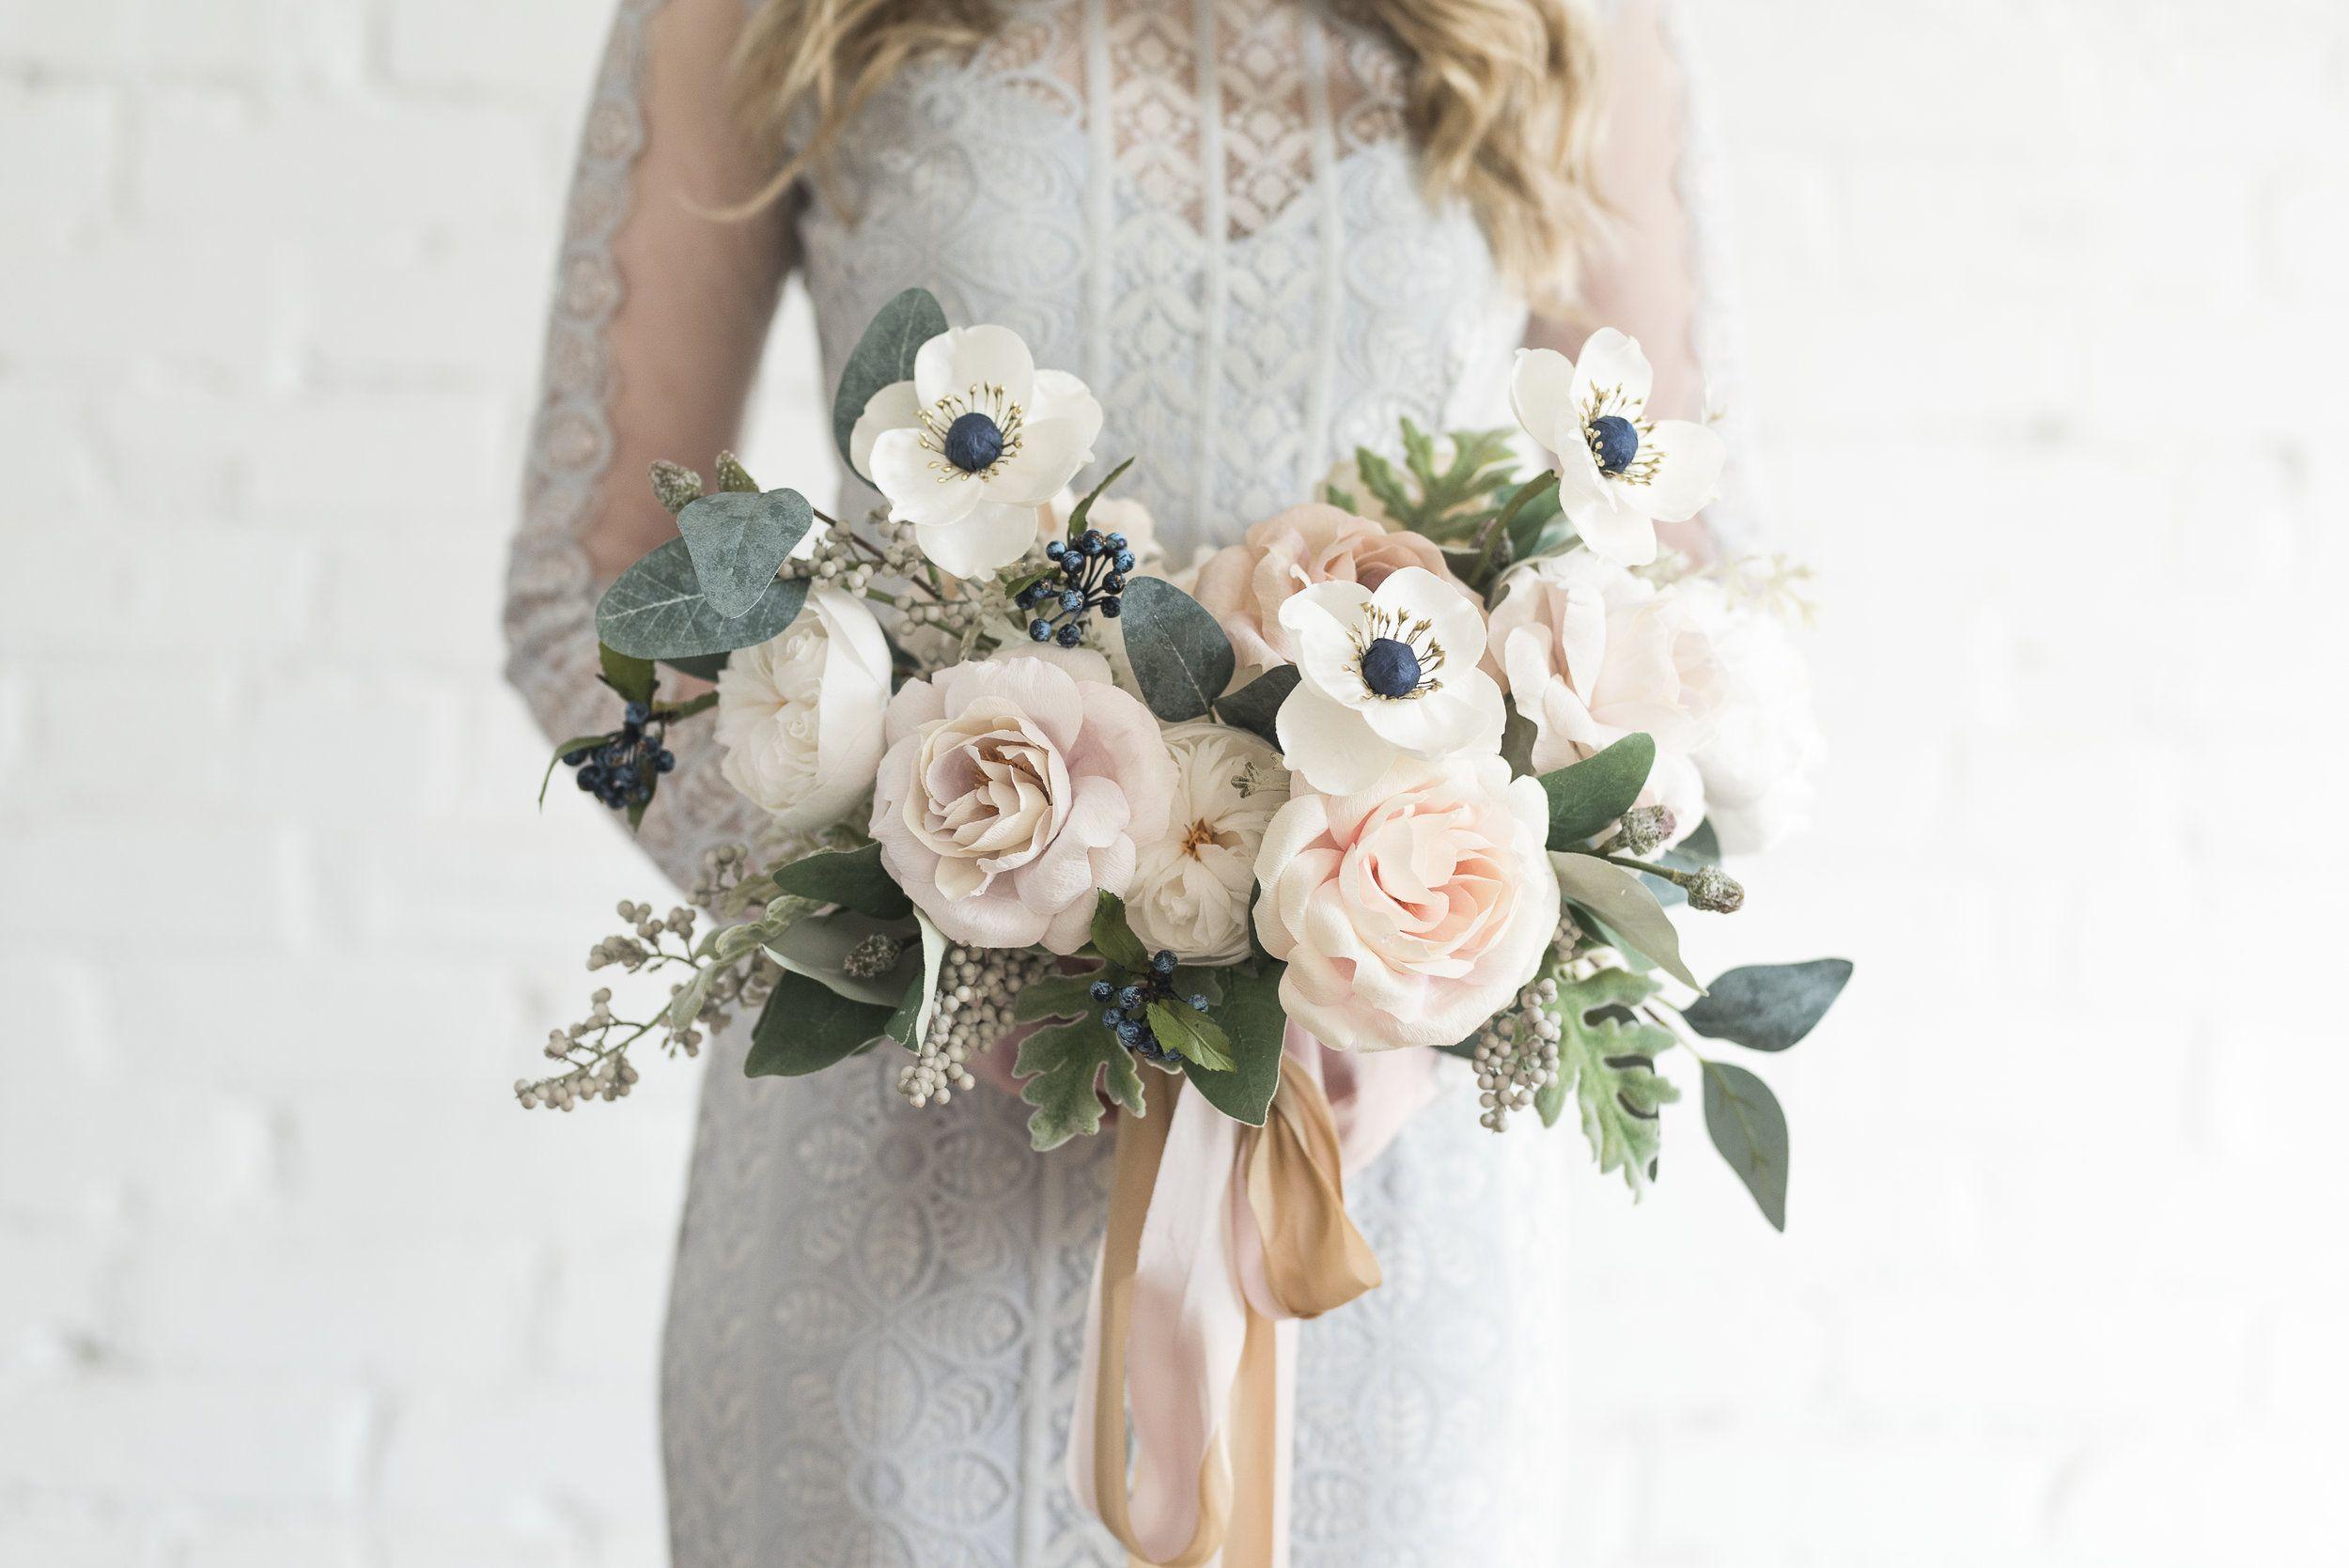 paper wedding bouquet - GENIUS